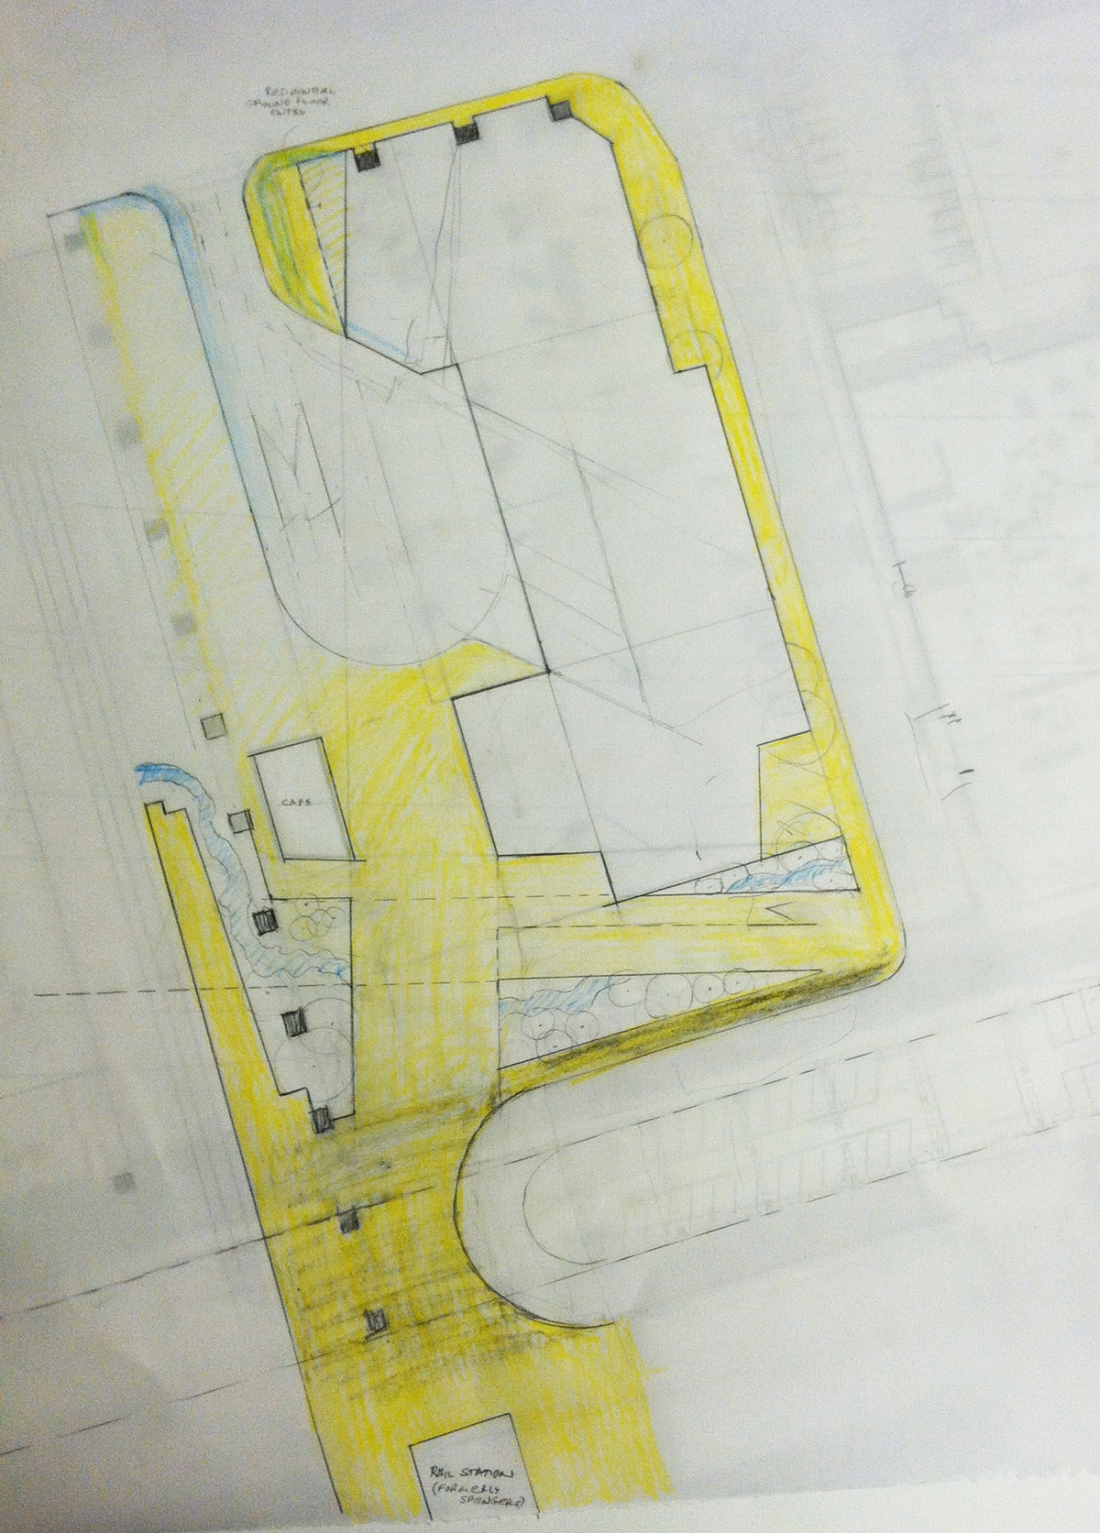 wilson_ground plan pedestrian and truck access_web